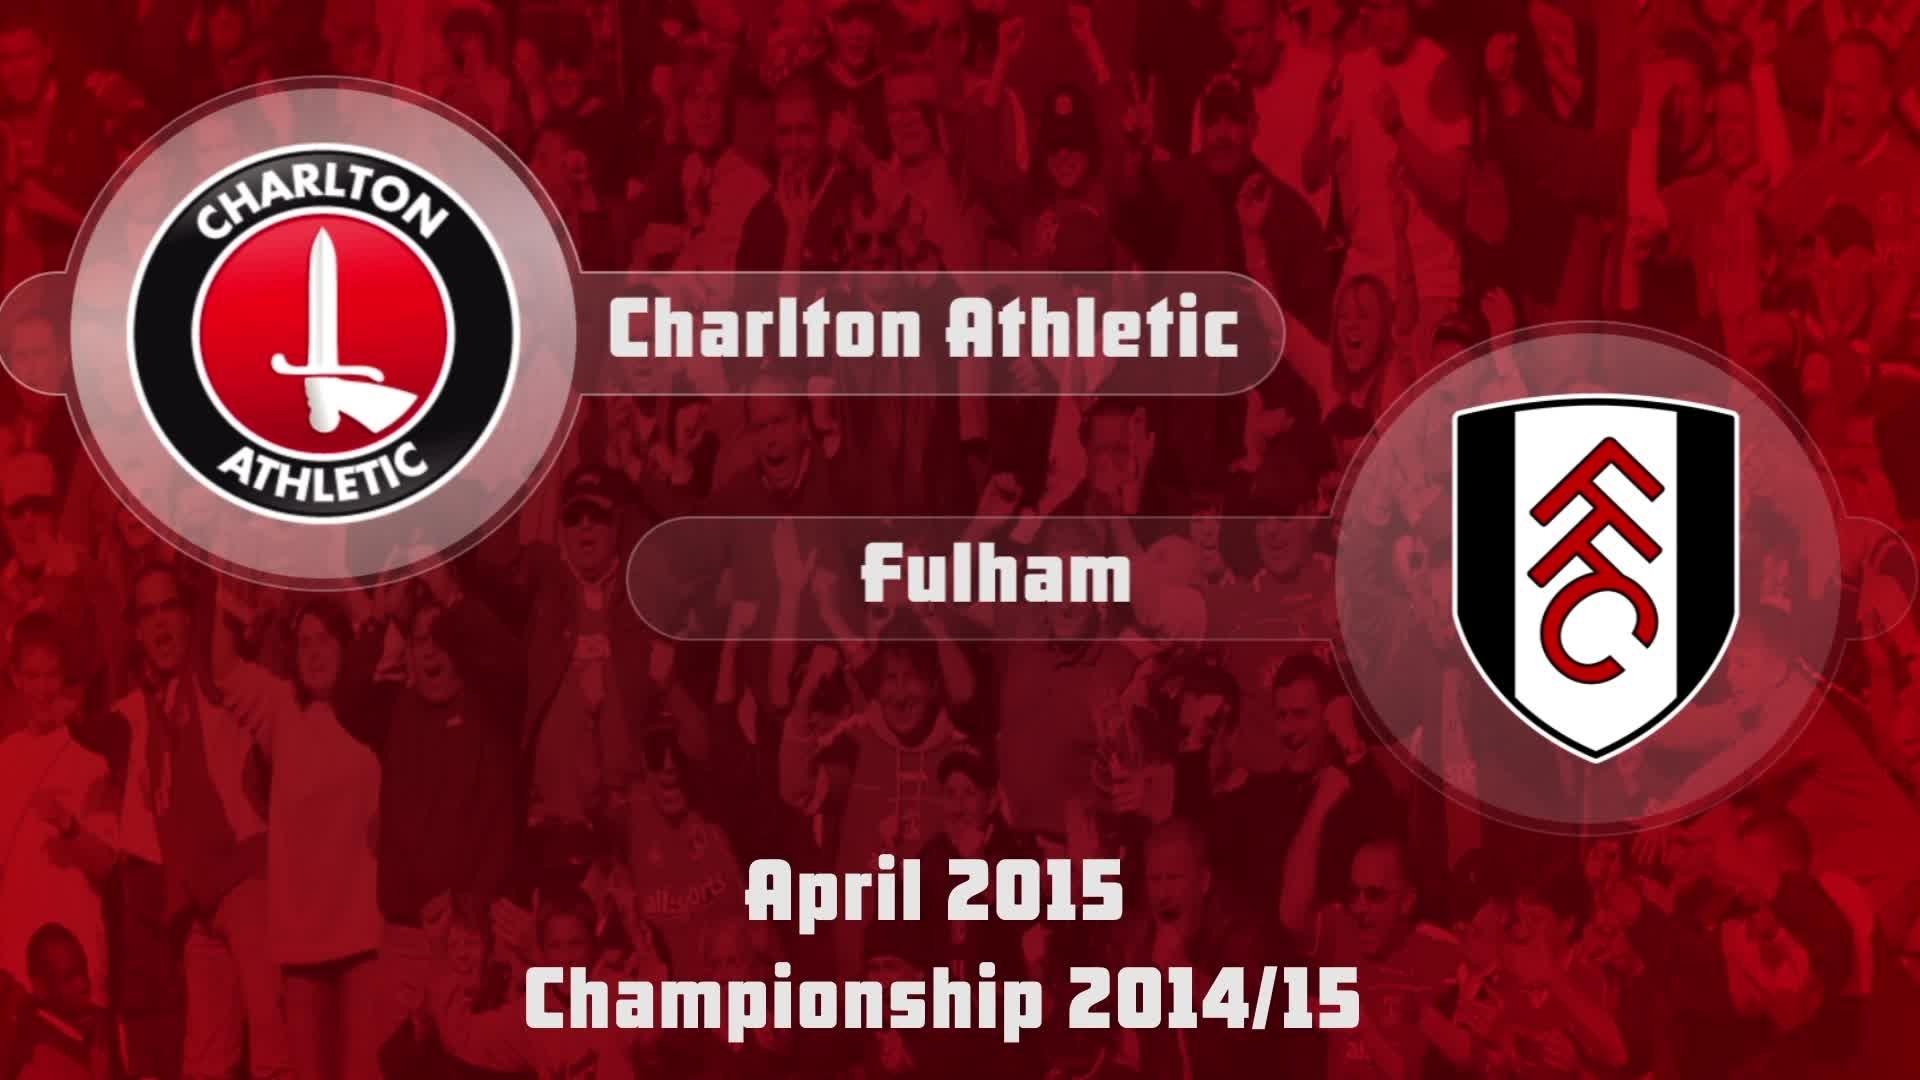 44 HIGHLIGHTS | Charlton 1 Fulham 1 (April 2015)